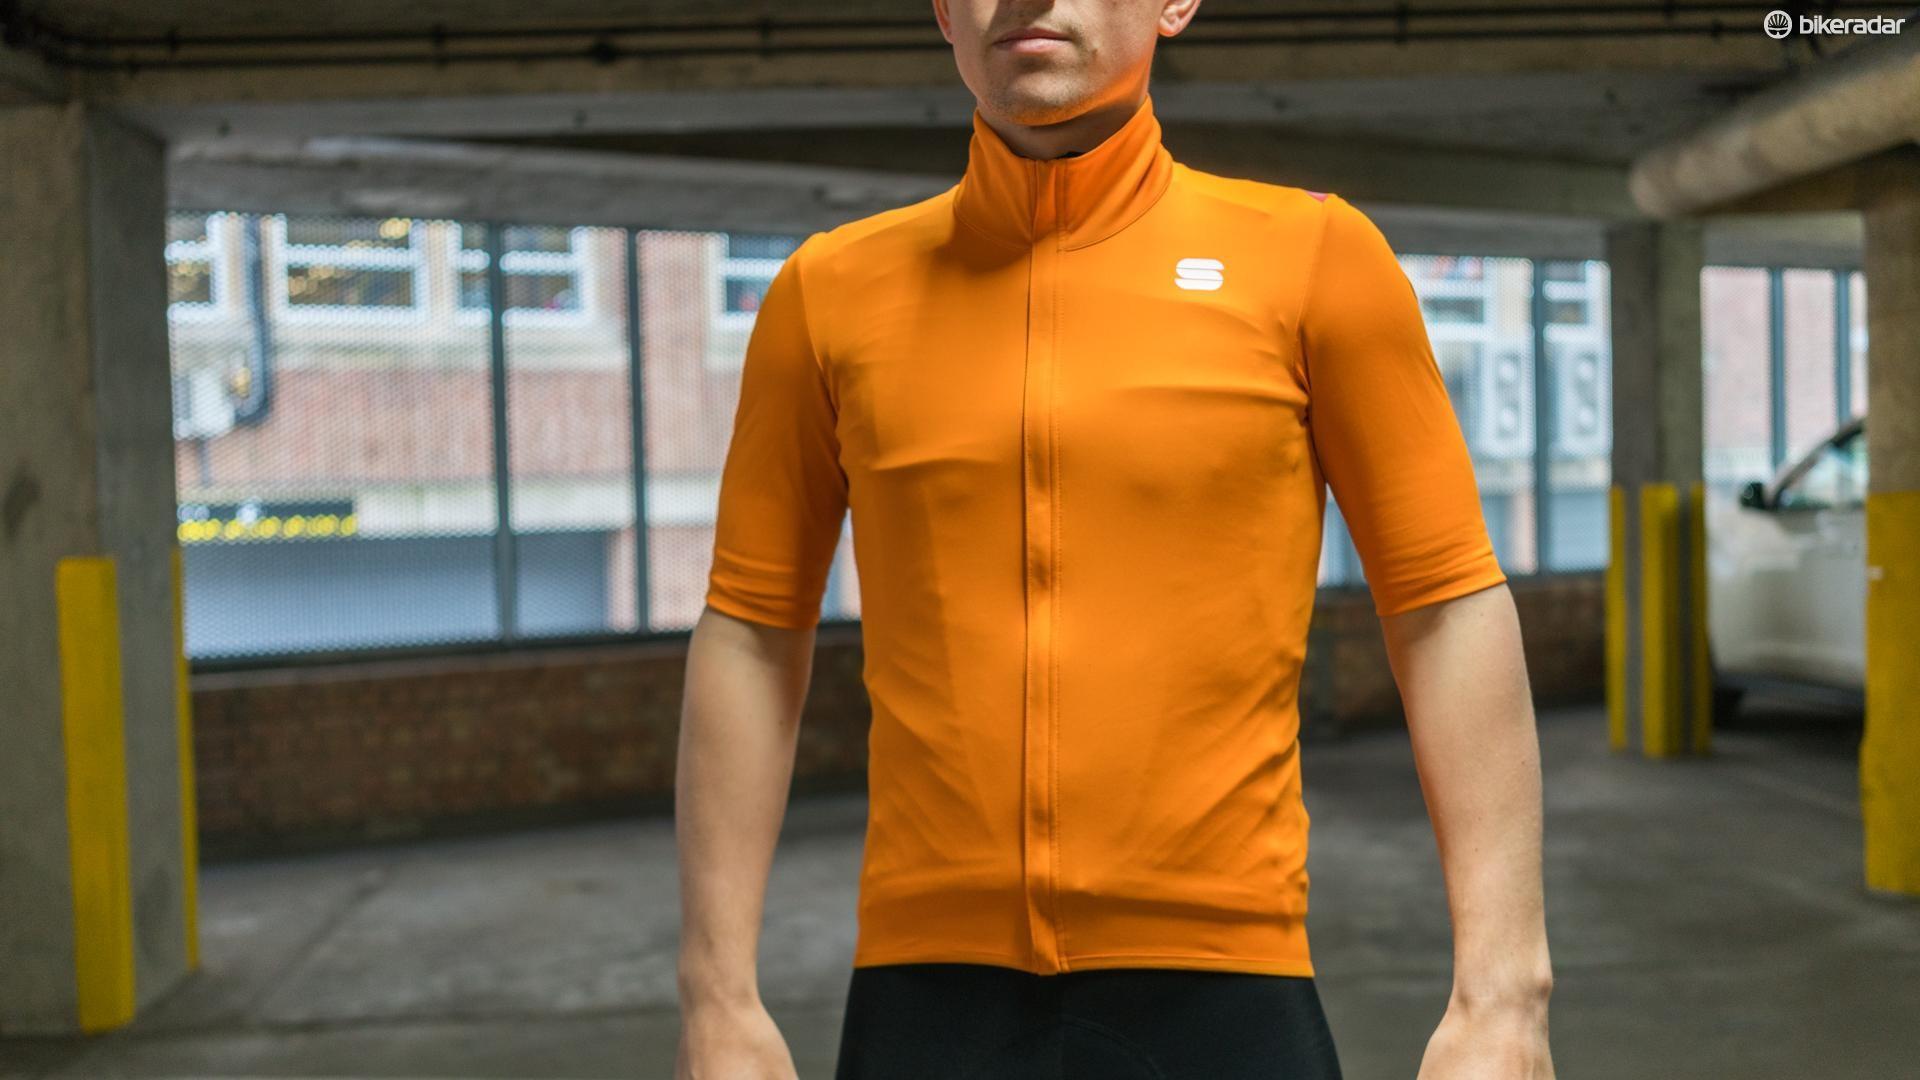 Sportful's Fiandre Light NoRain SS jacket